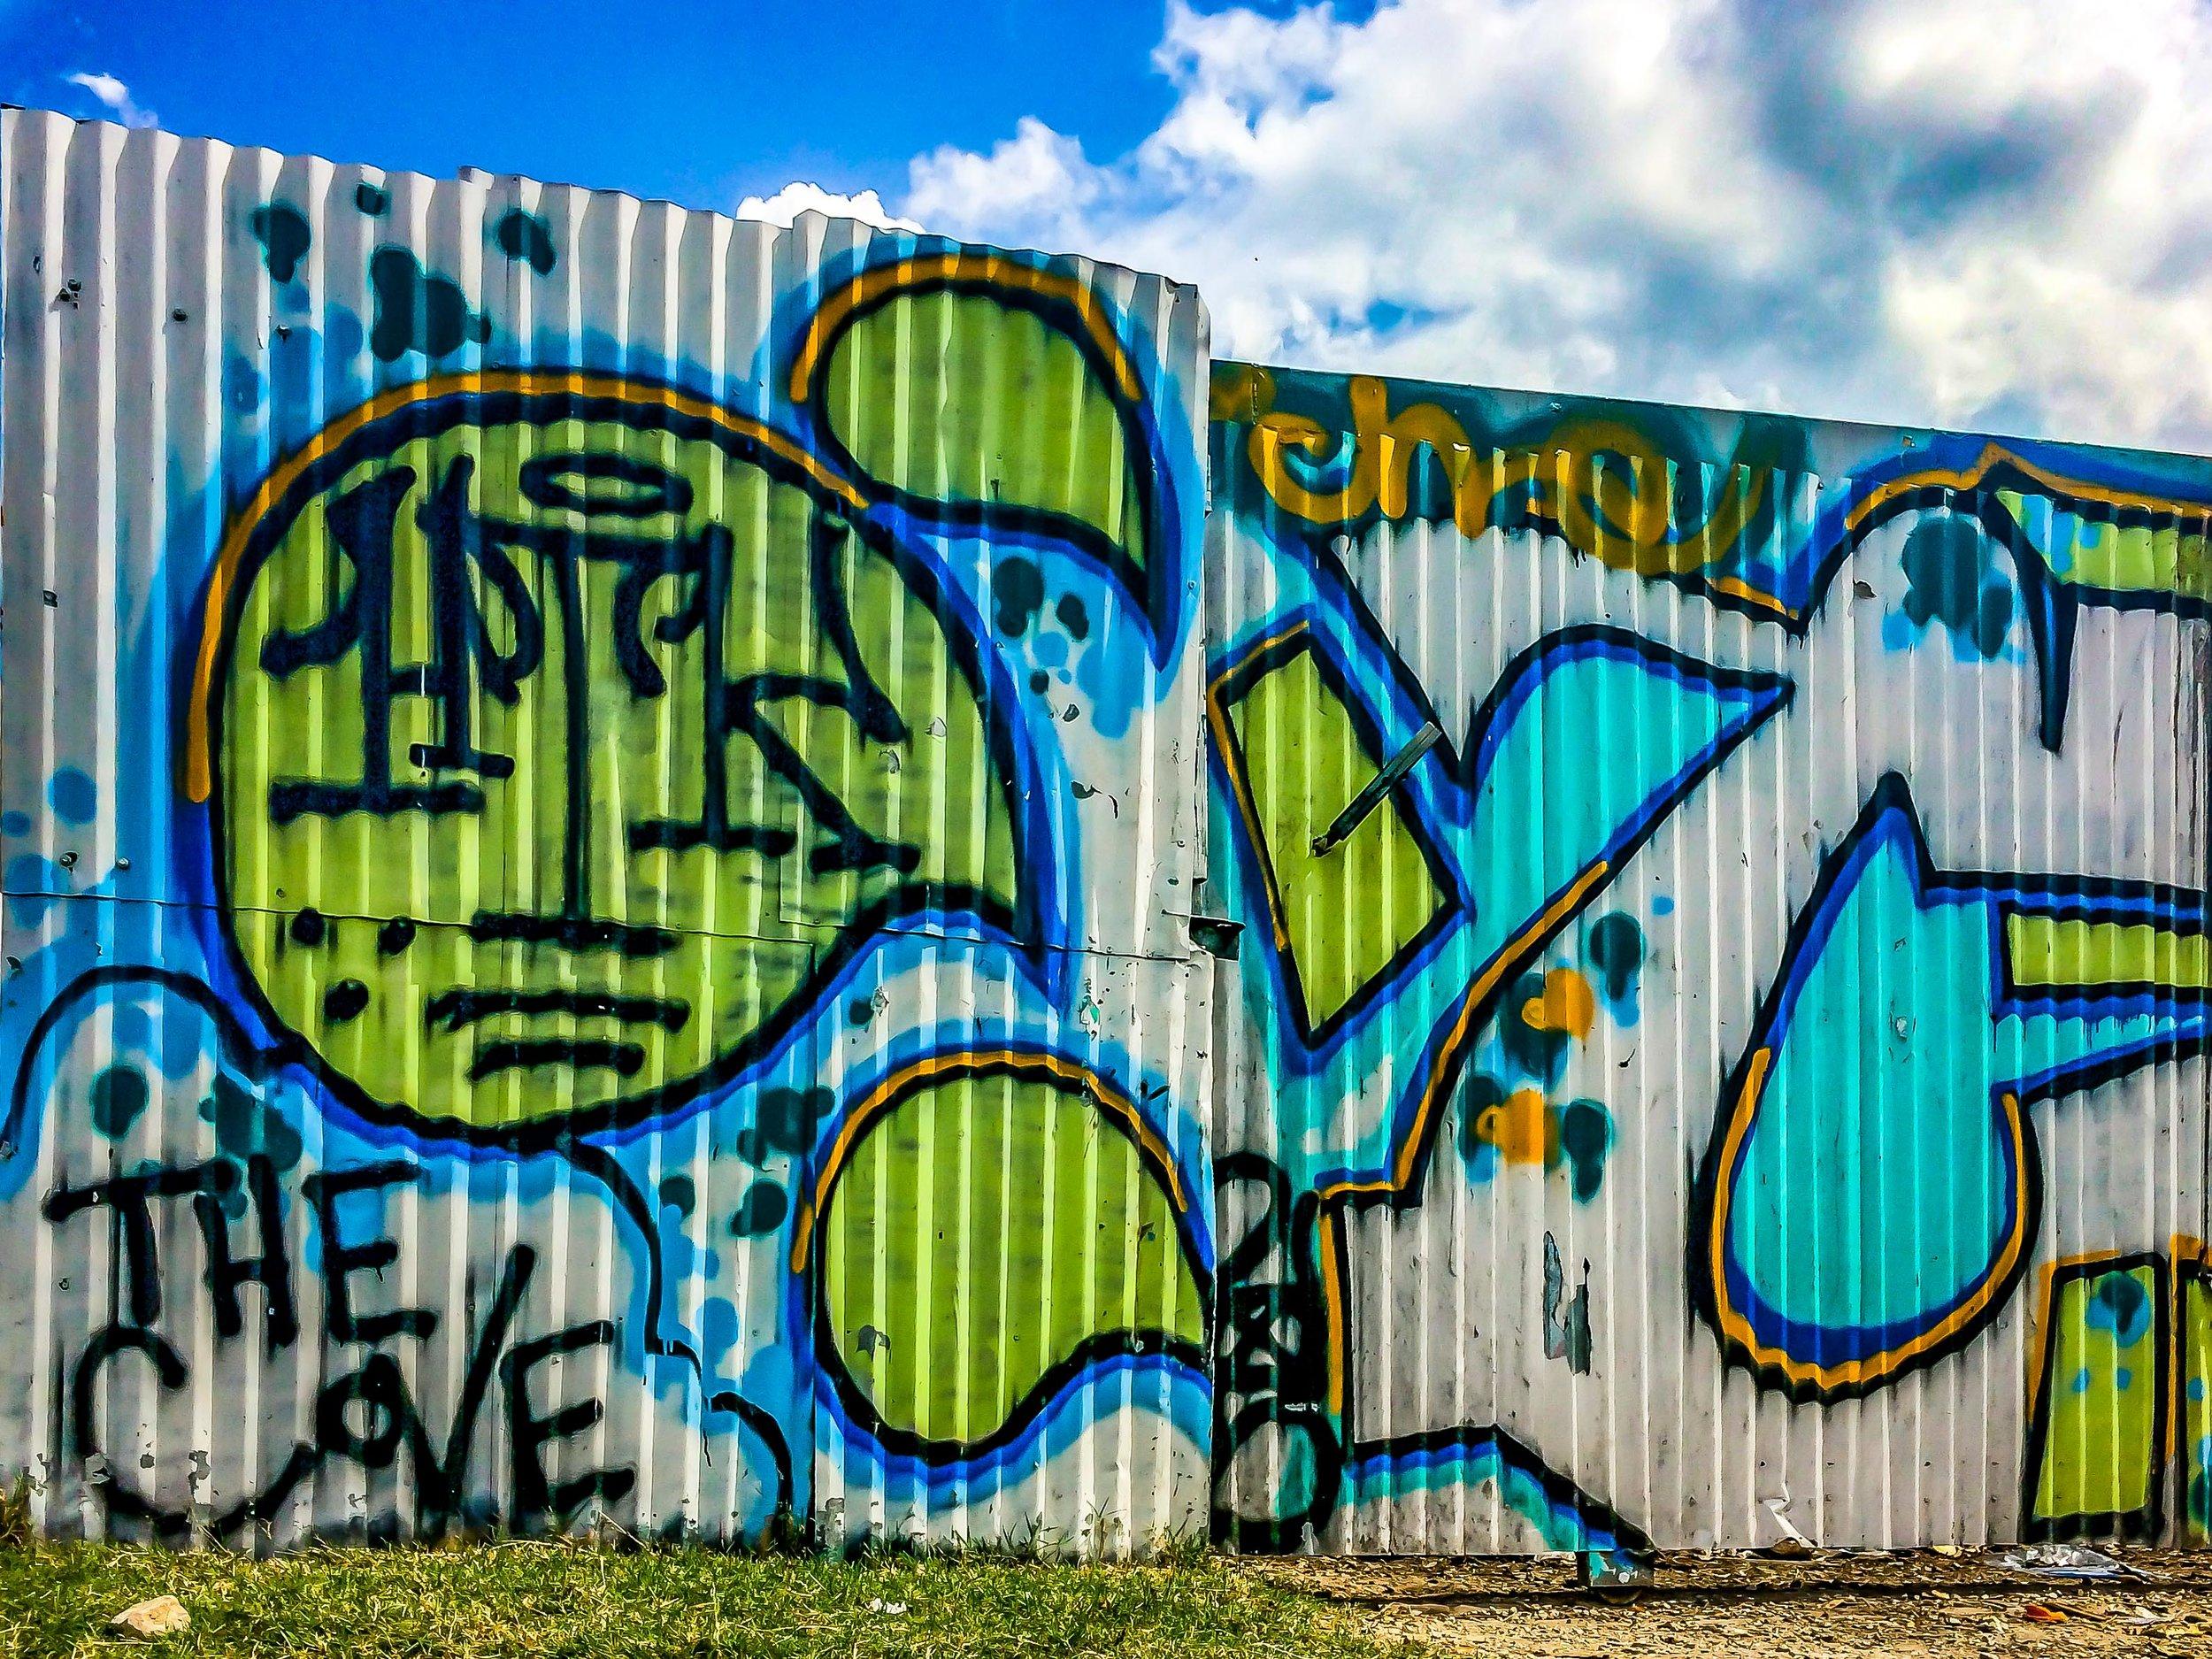 Grafitti 1 - danscape - iPhone (4 of 46).jpg